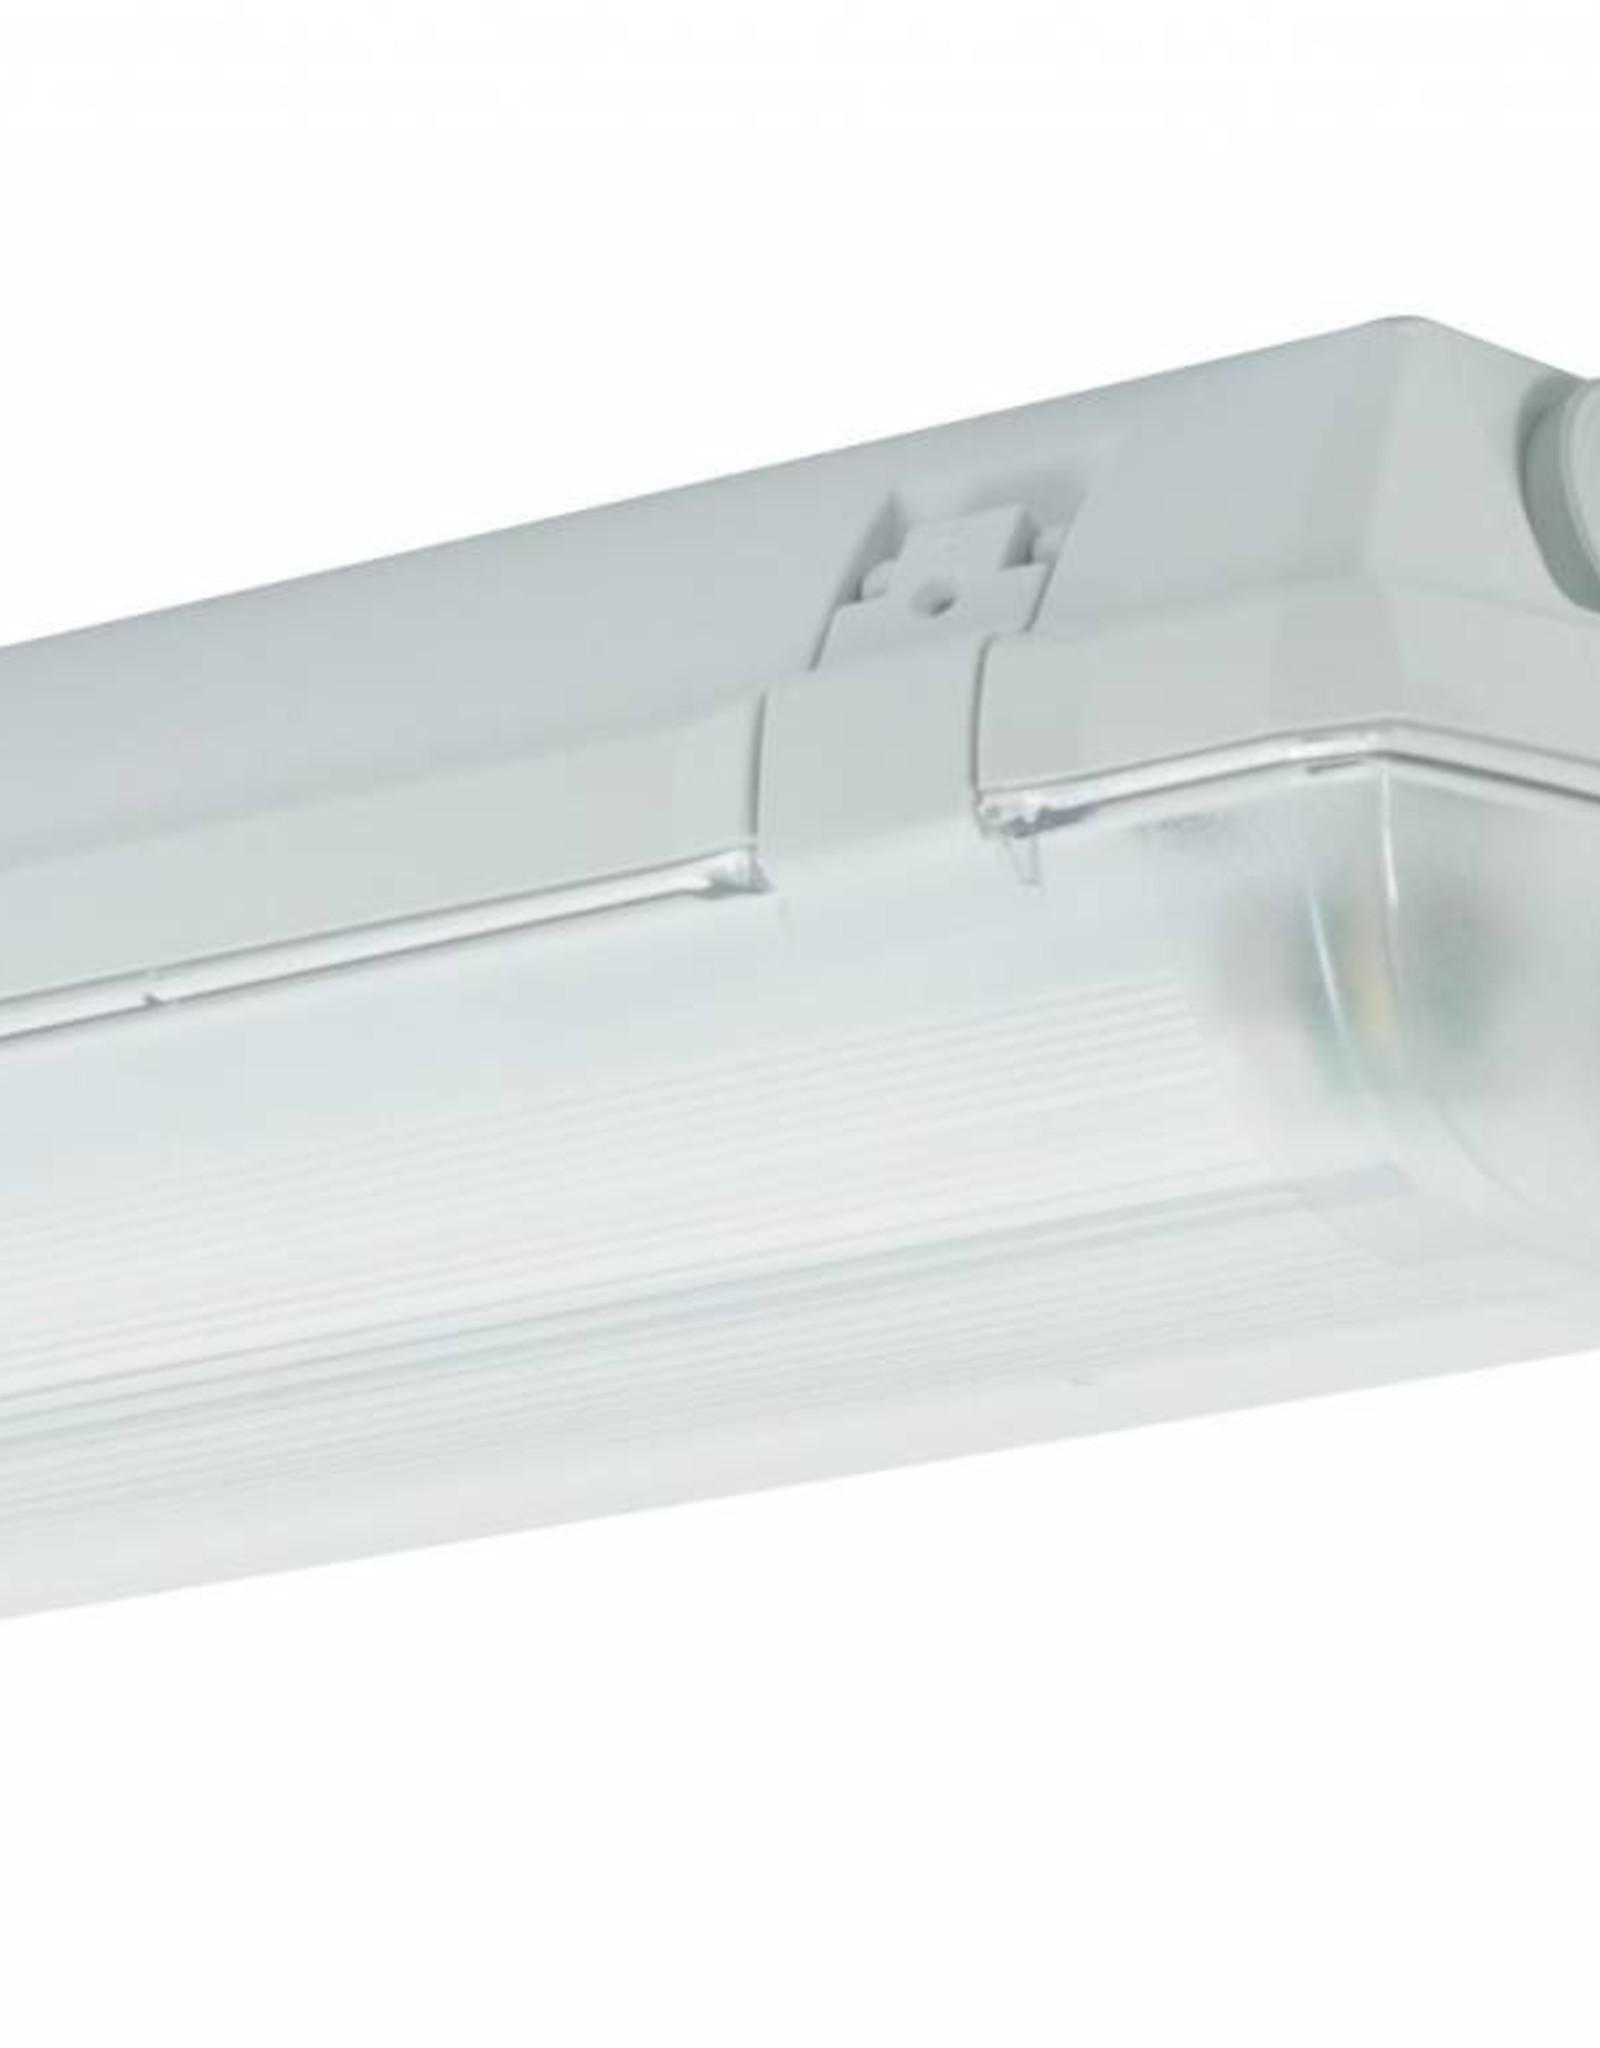 Prima 1x54W HO - ABS - inox clips - HF ballast